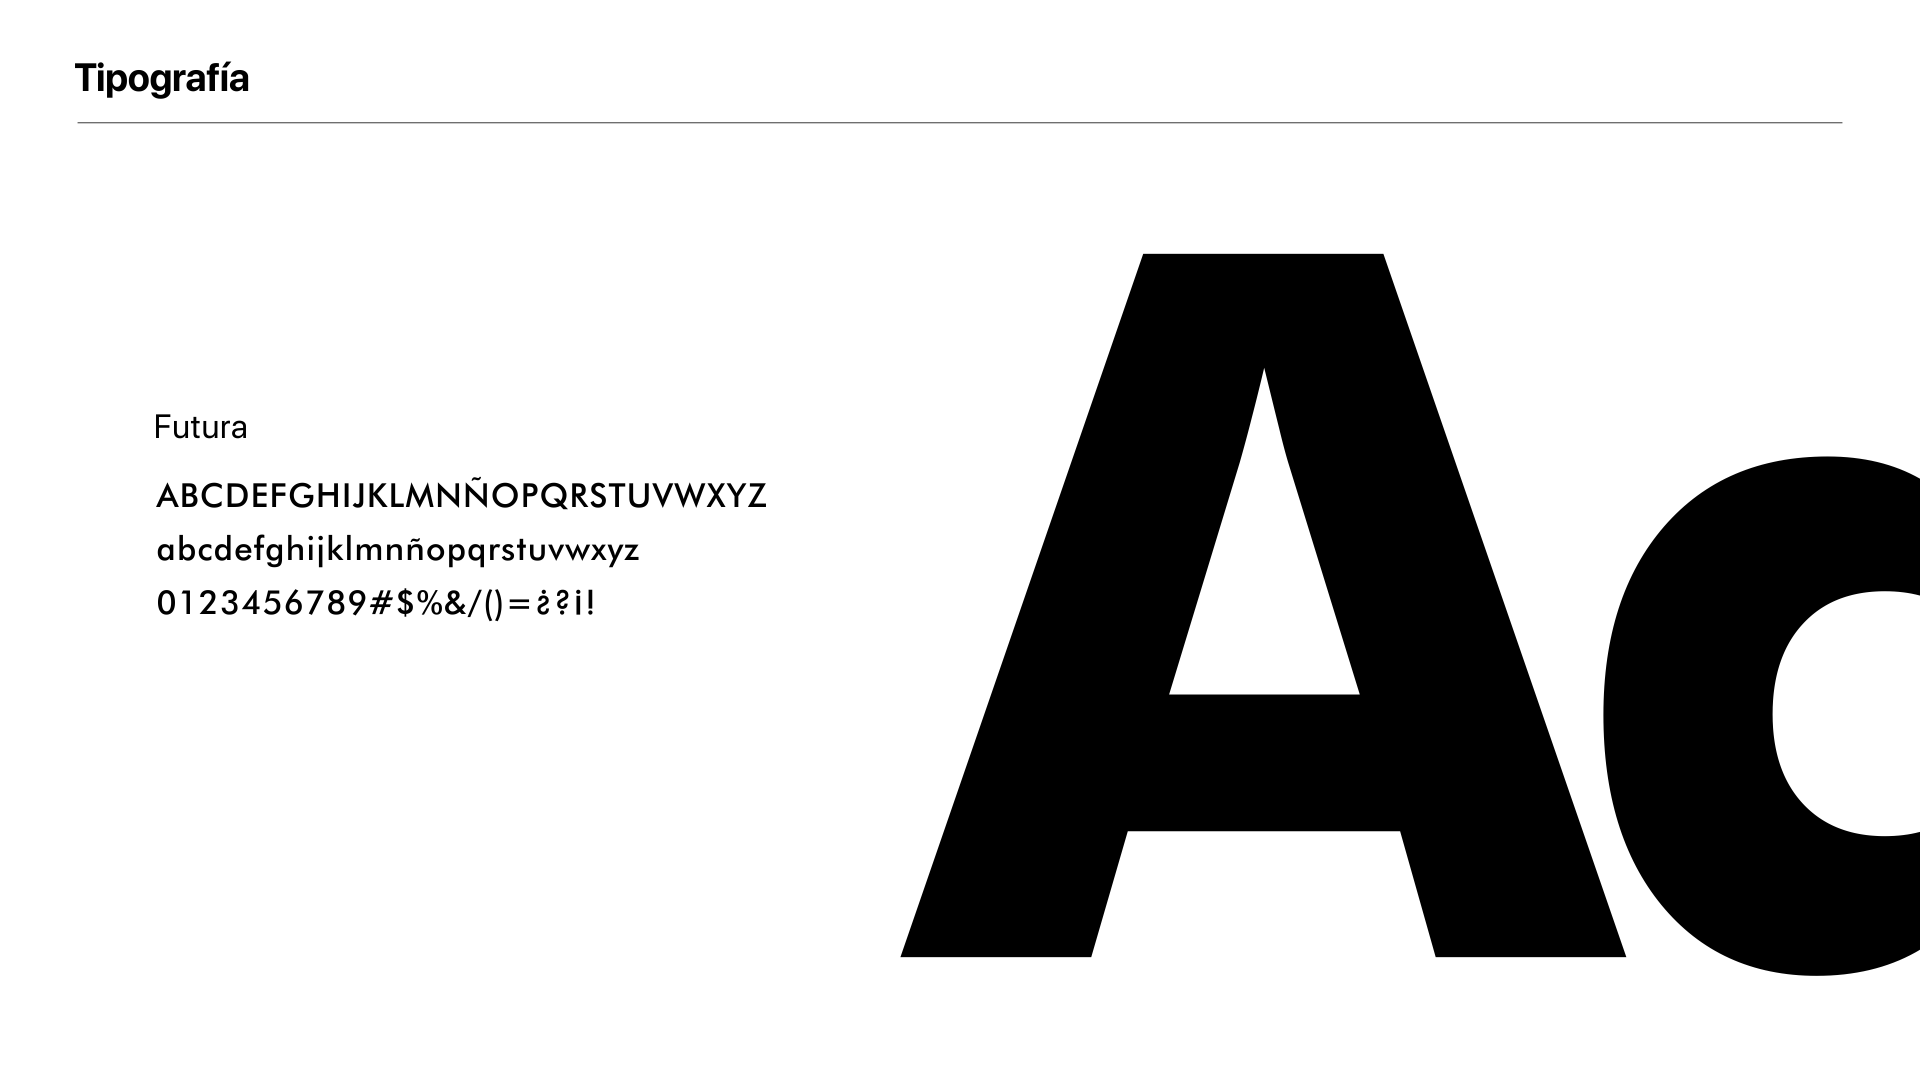 familia tipográfica de la marca